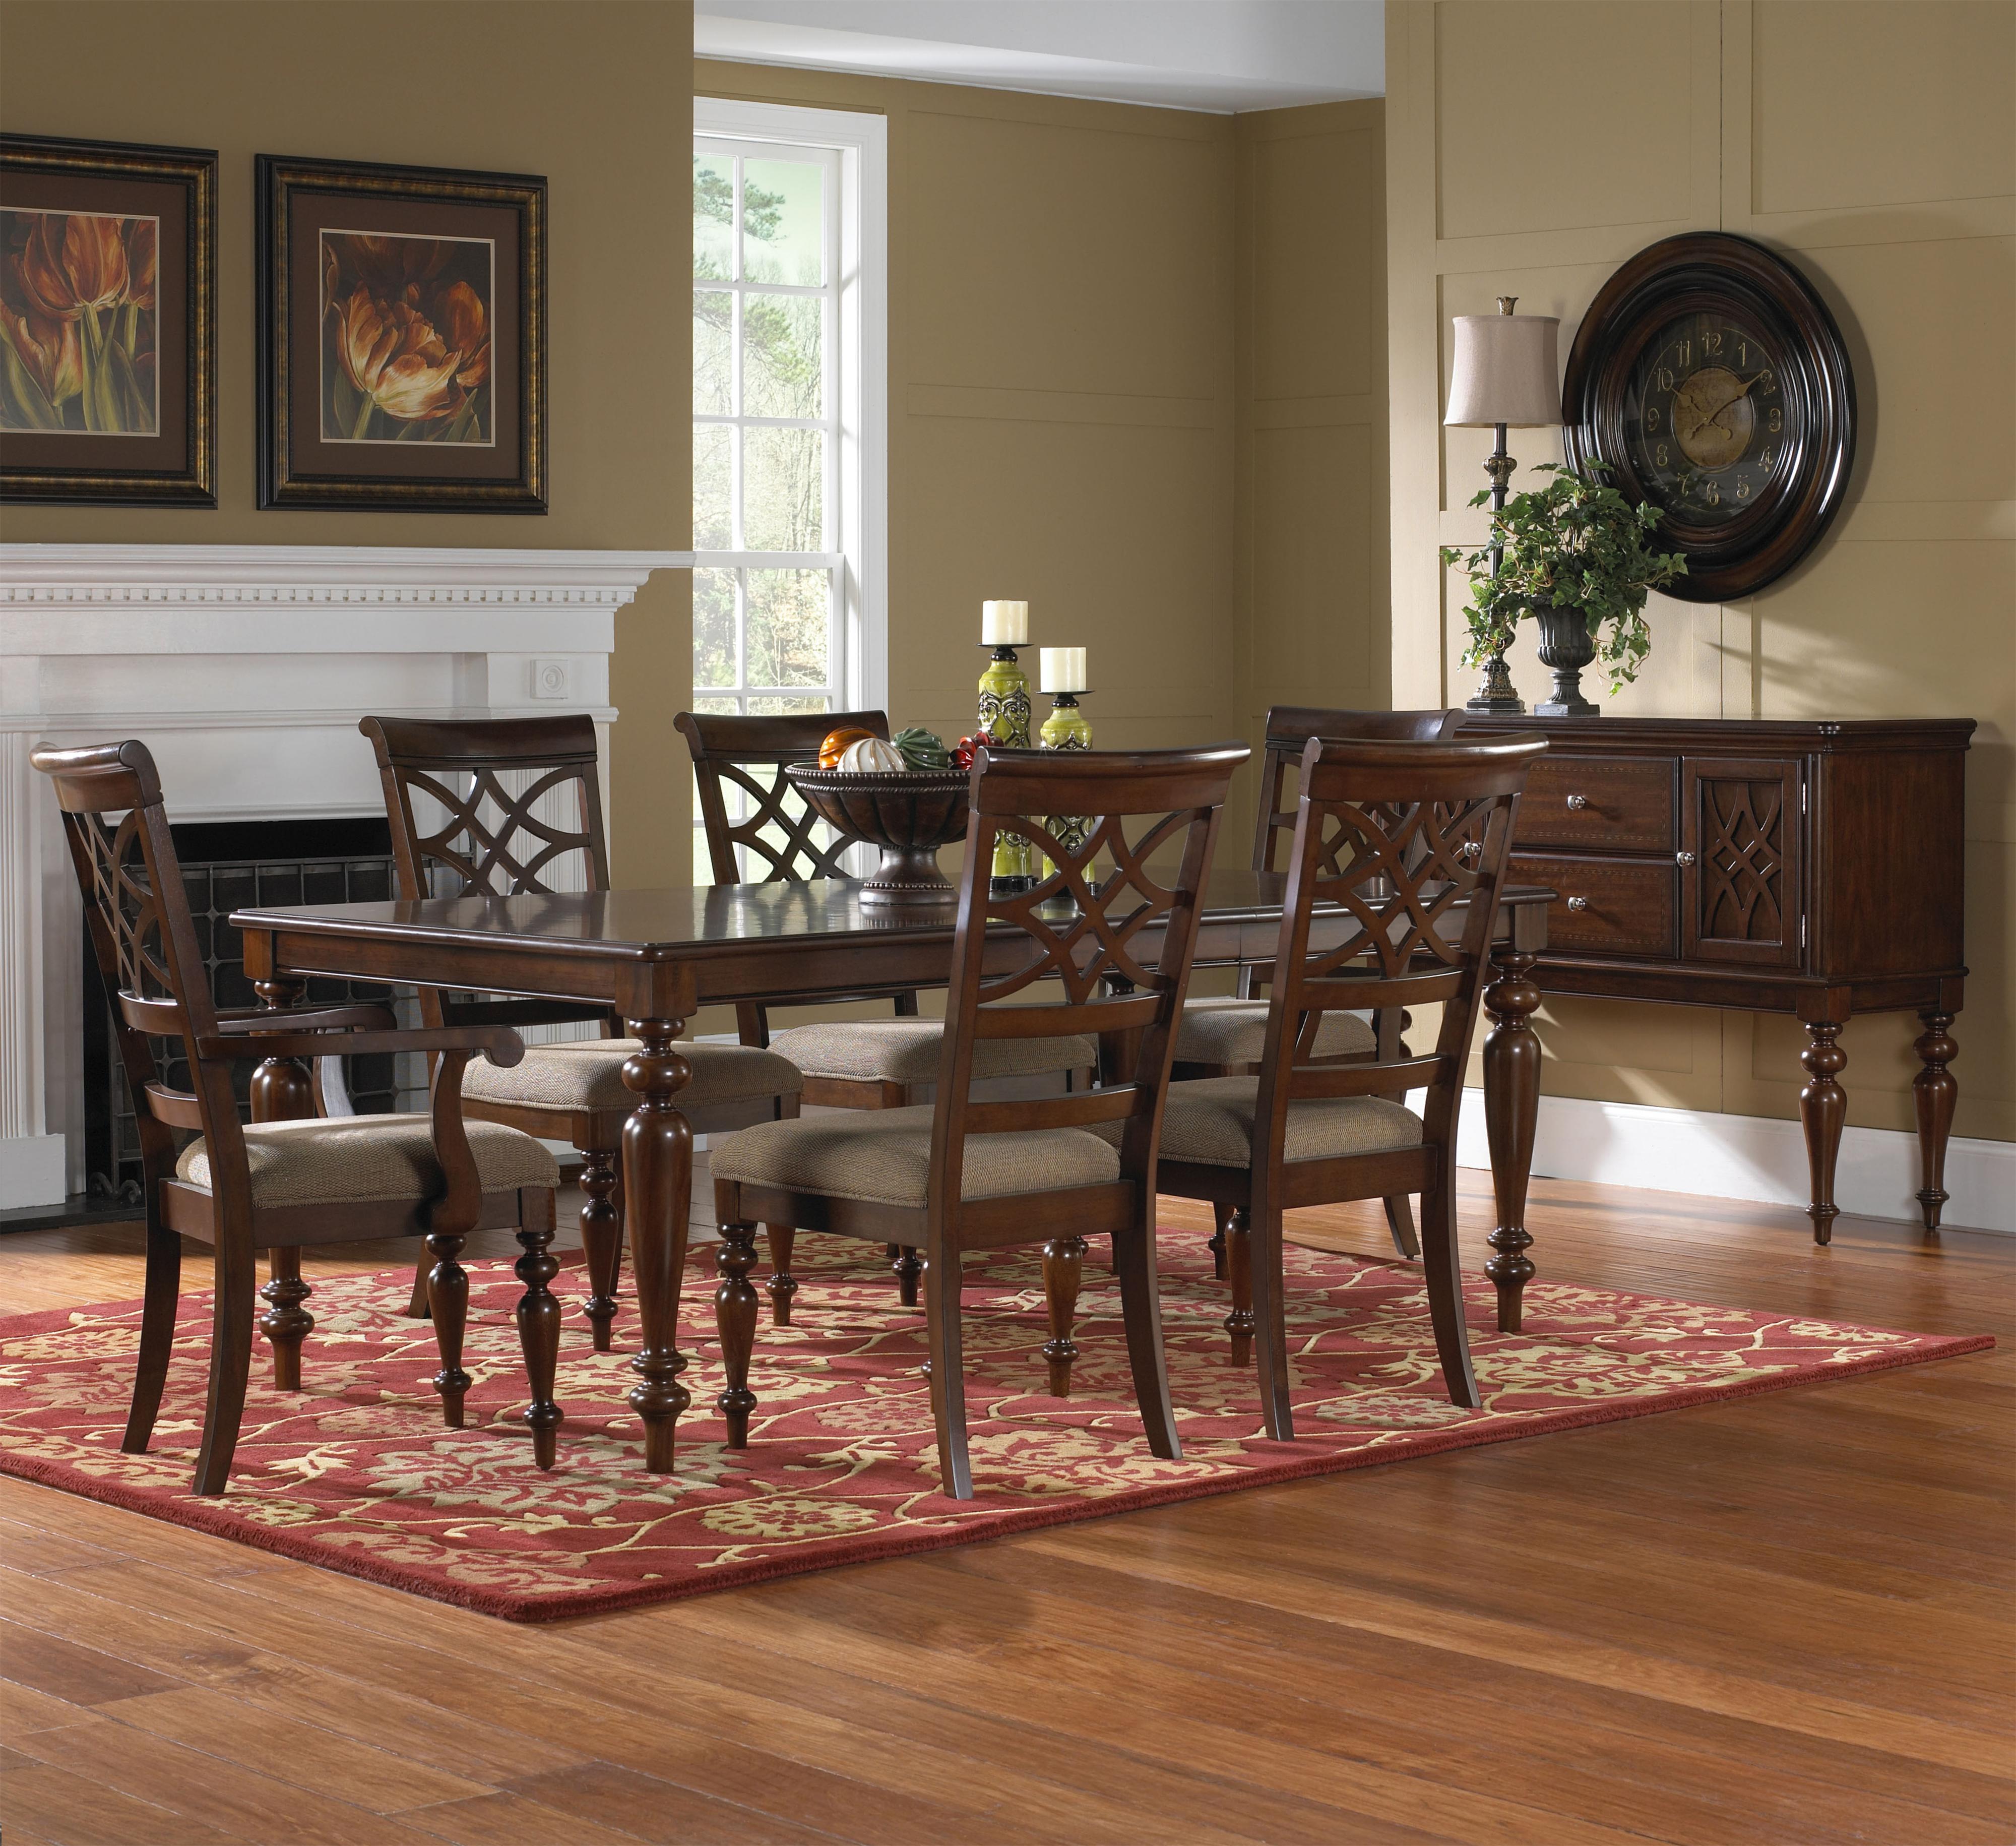 standard furniture woodmont 7 piece rectangular dining table upholstered chair set great. Black Bedroom Furniture Sets. Home Design Ideas